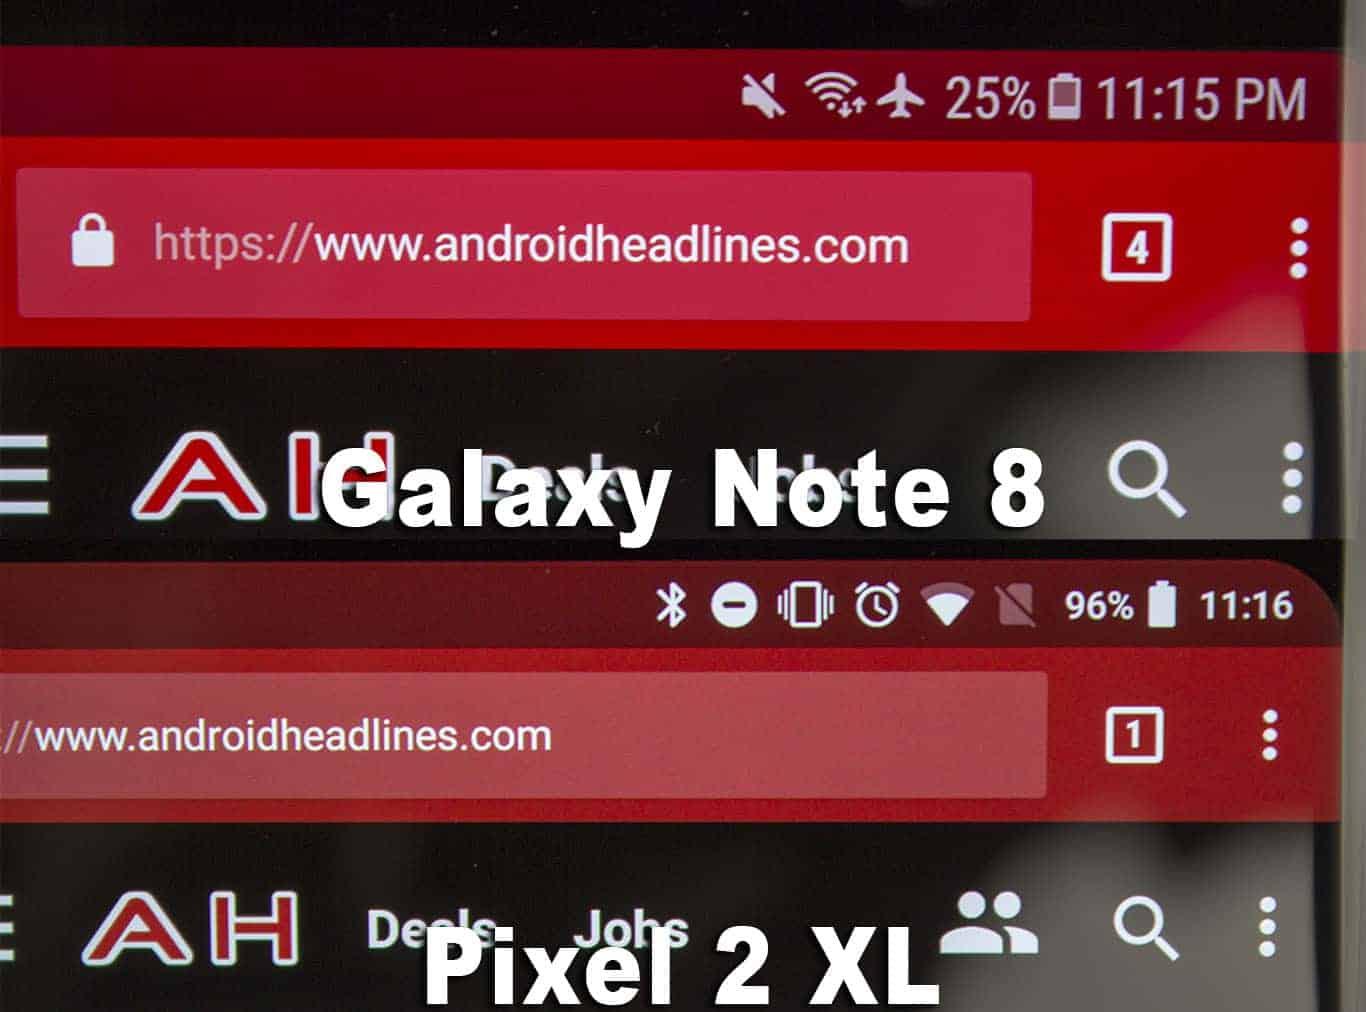 Google Pixel 2 XL Display Compare 2